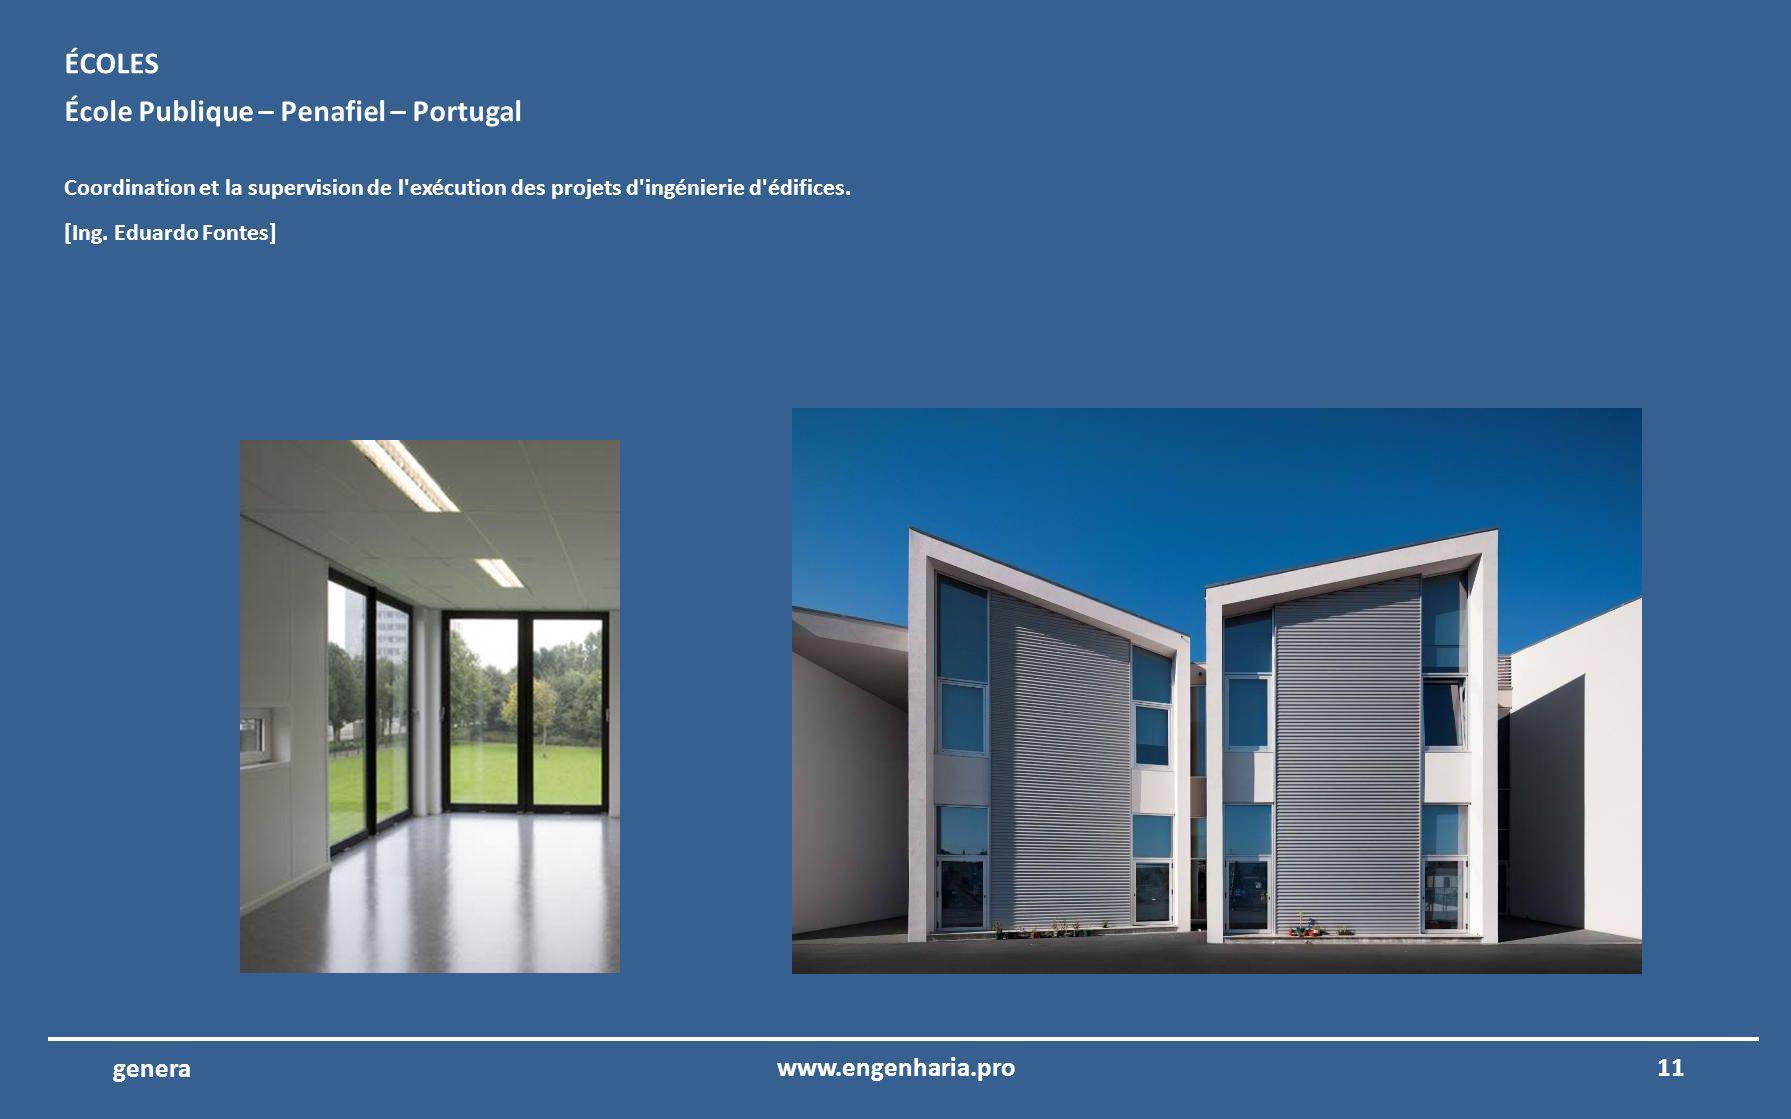 10www.engenharia.pro genera Hôpital de Portimão – Portimão – Portugal Coordination et la supervision des l exécution des projets d ingénierie de lHôpital Portimão.